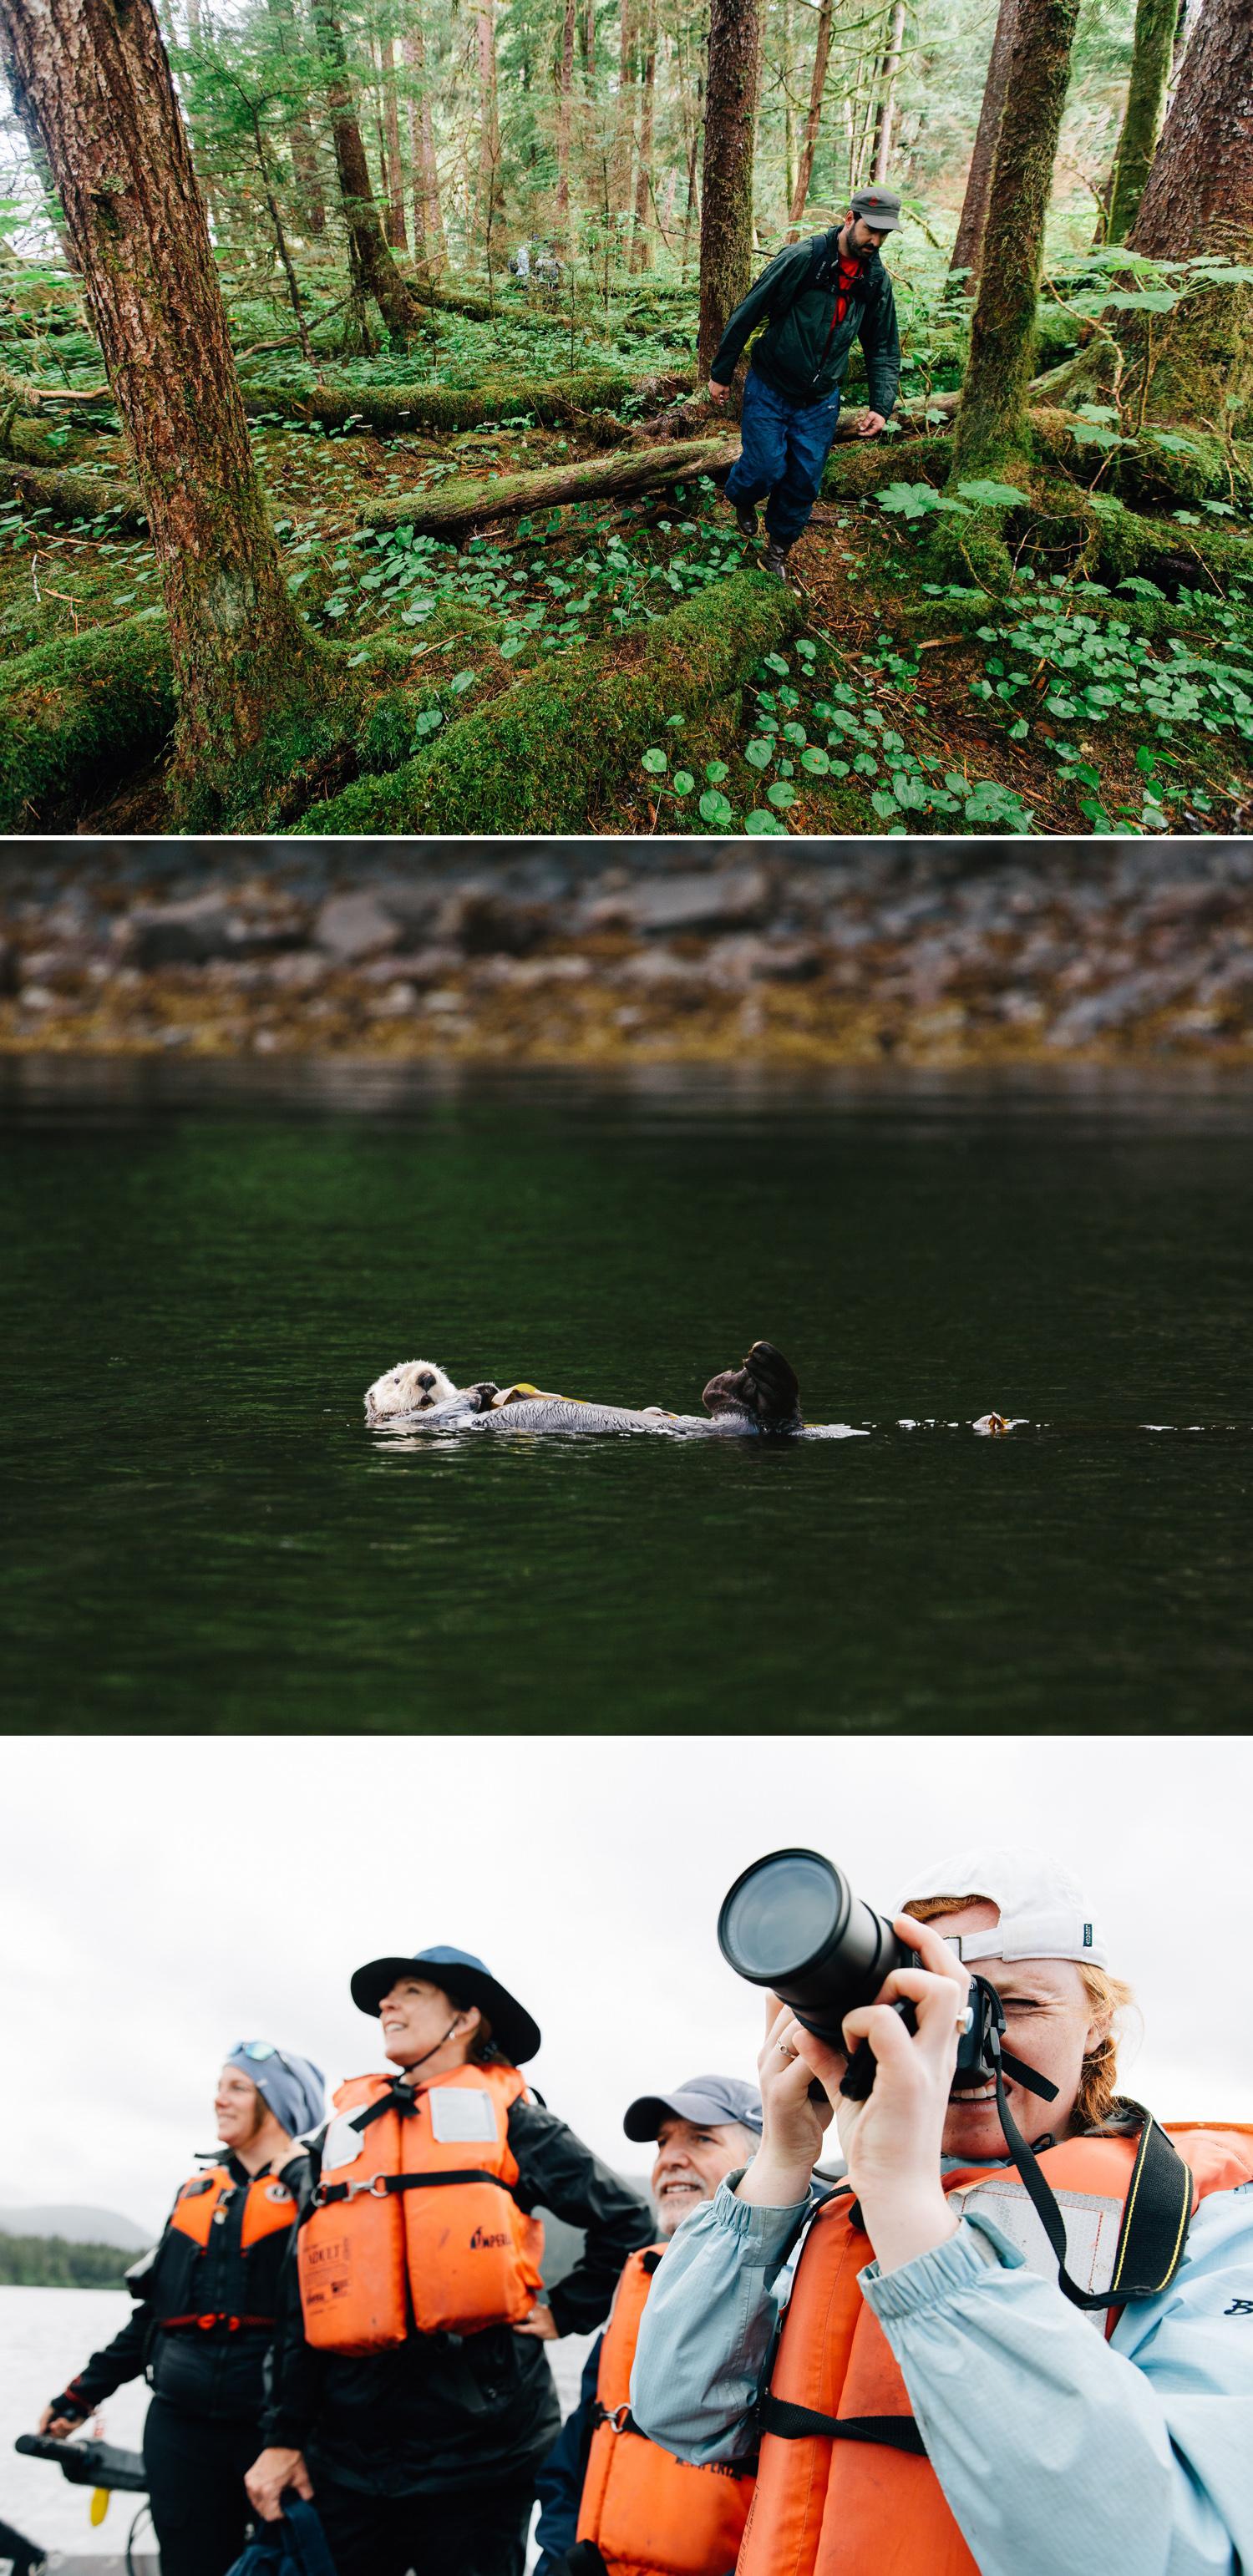 cameron-zegers-photography-alaska-uncruise-travel-3.jpg